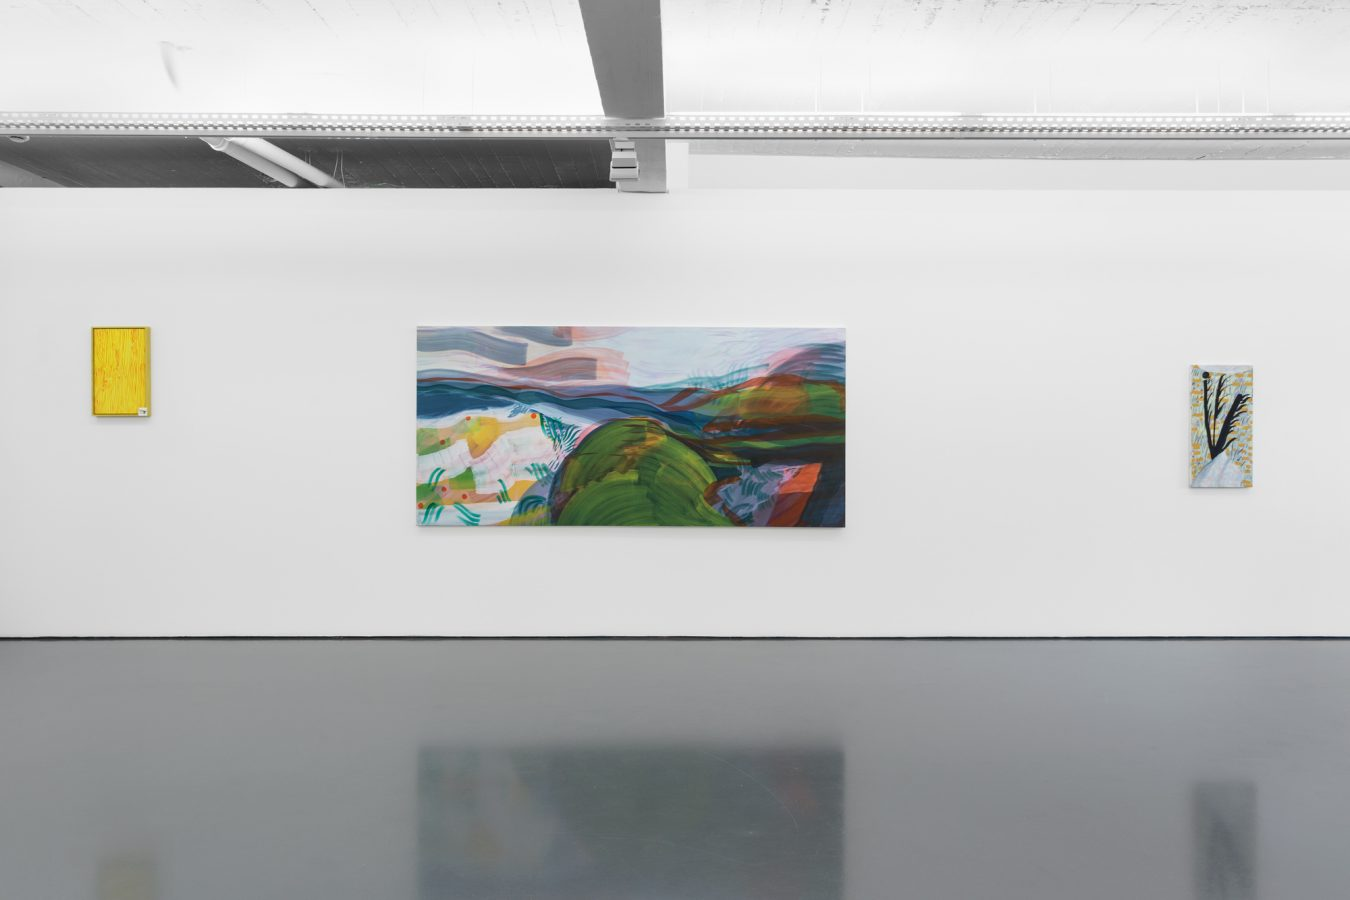 Galeria Pedro Cera – Ana Manso - Eye Massage